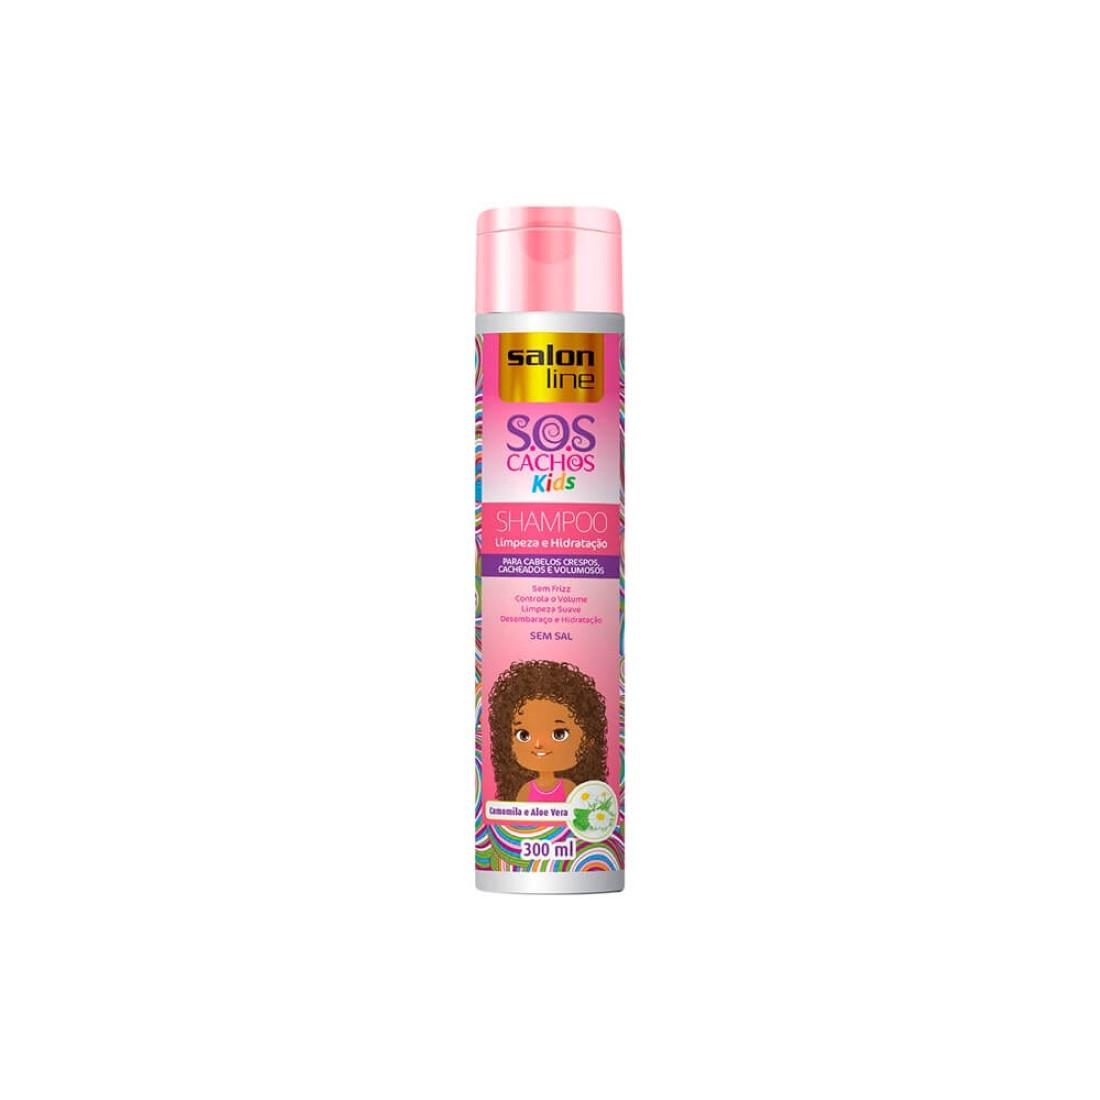 Shampoo S.O.S Cachos Kids 300ml - Salon Line